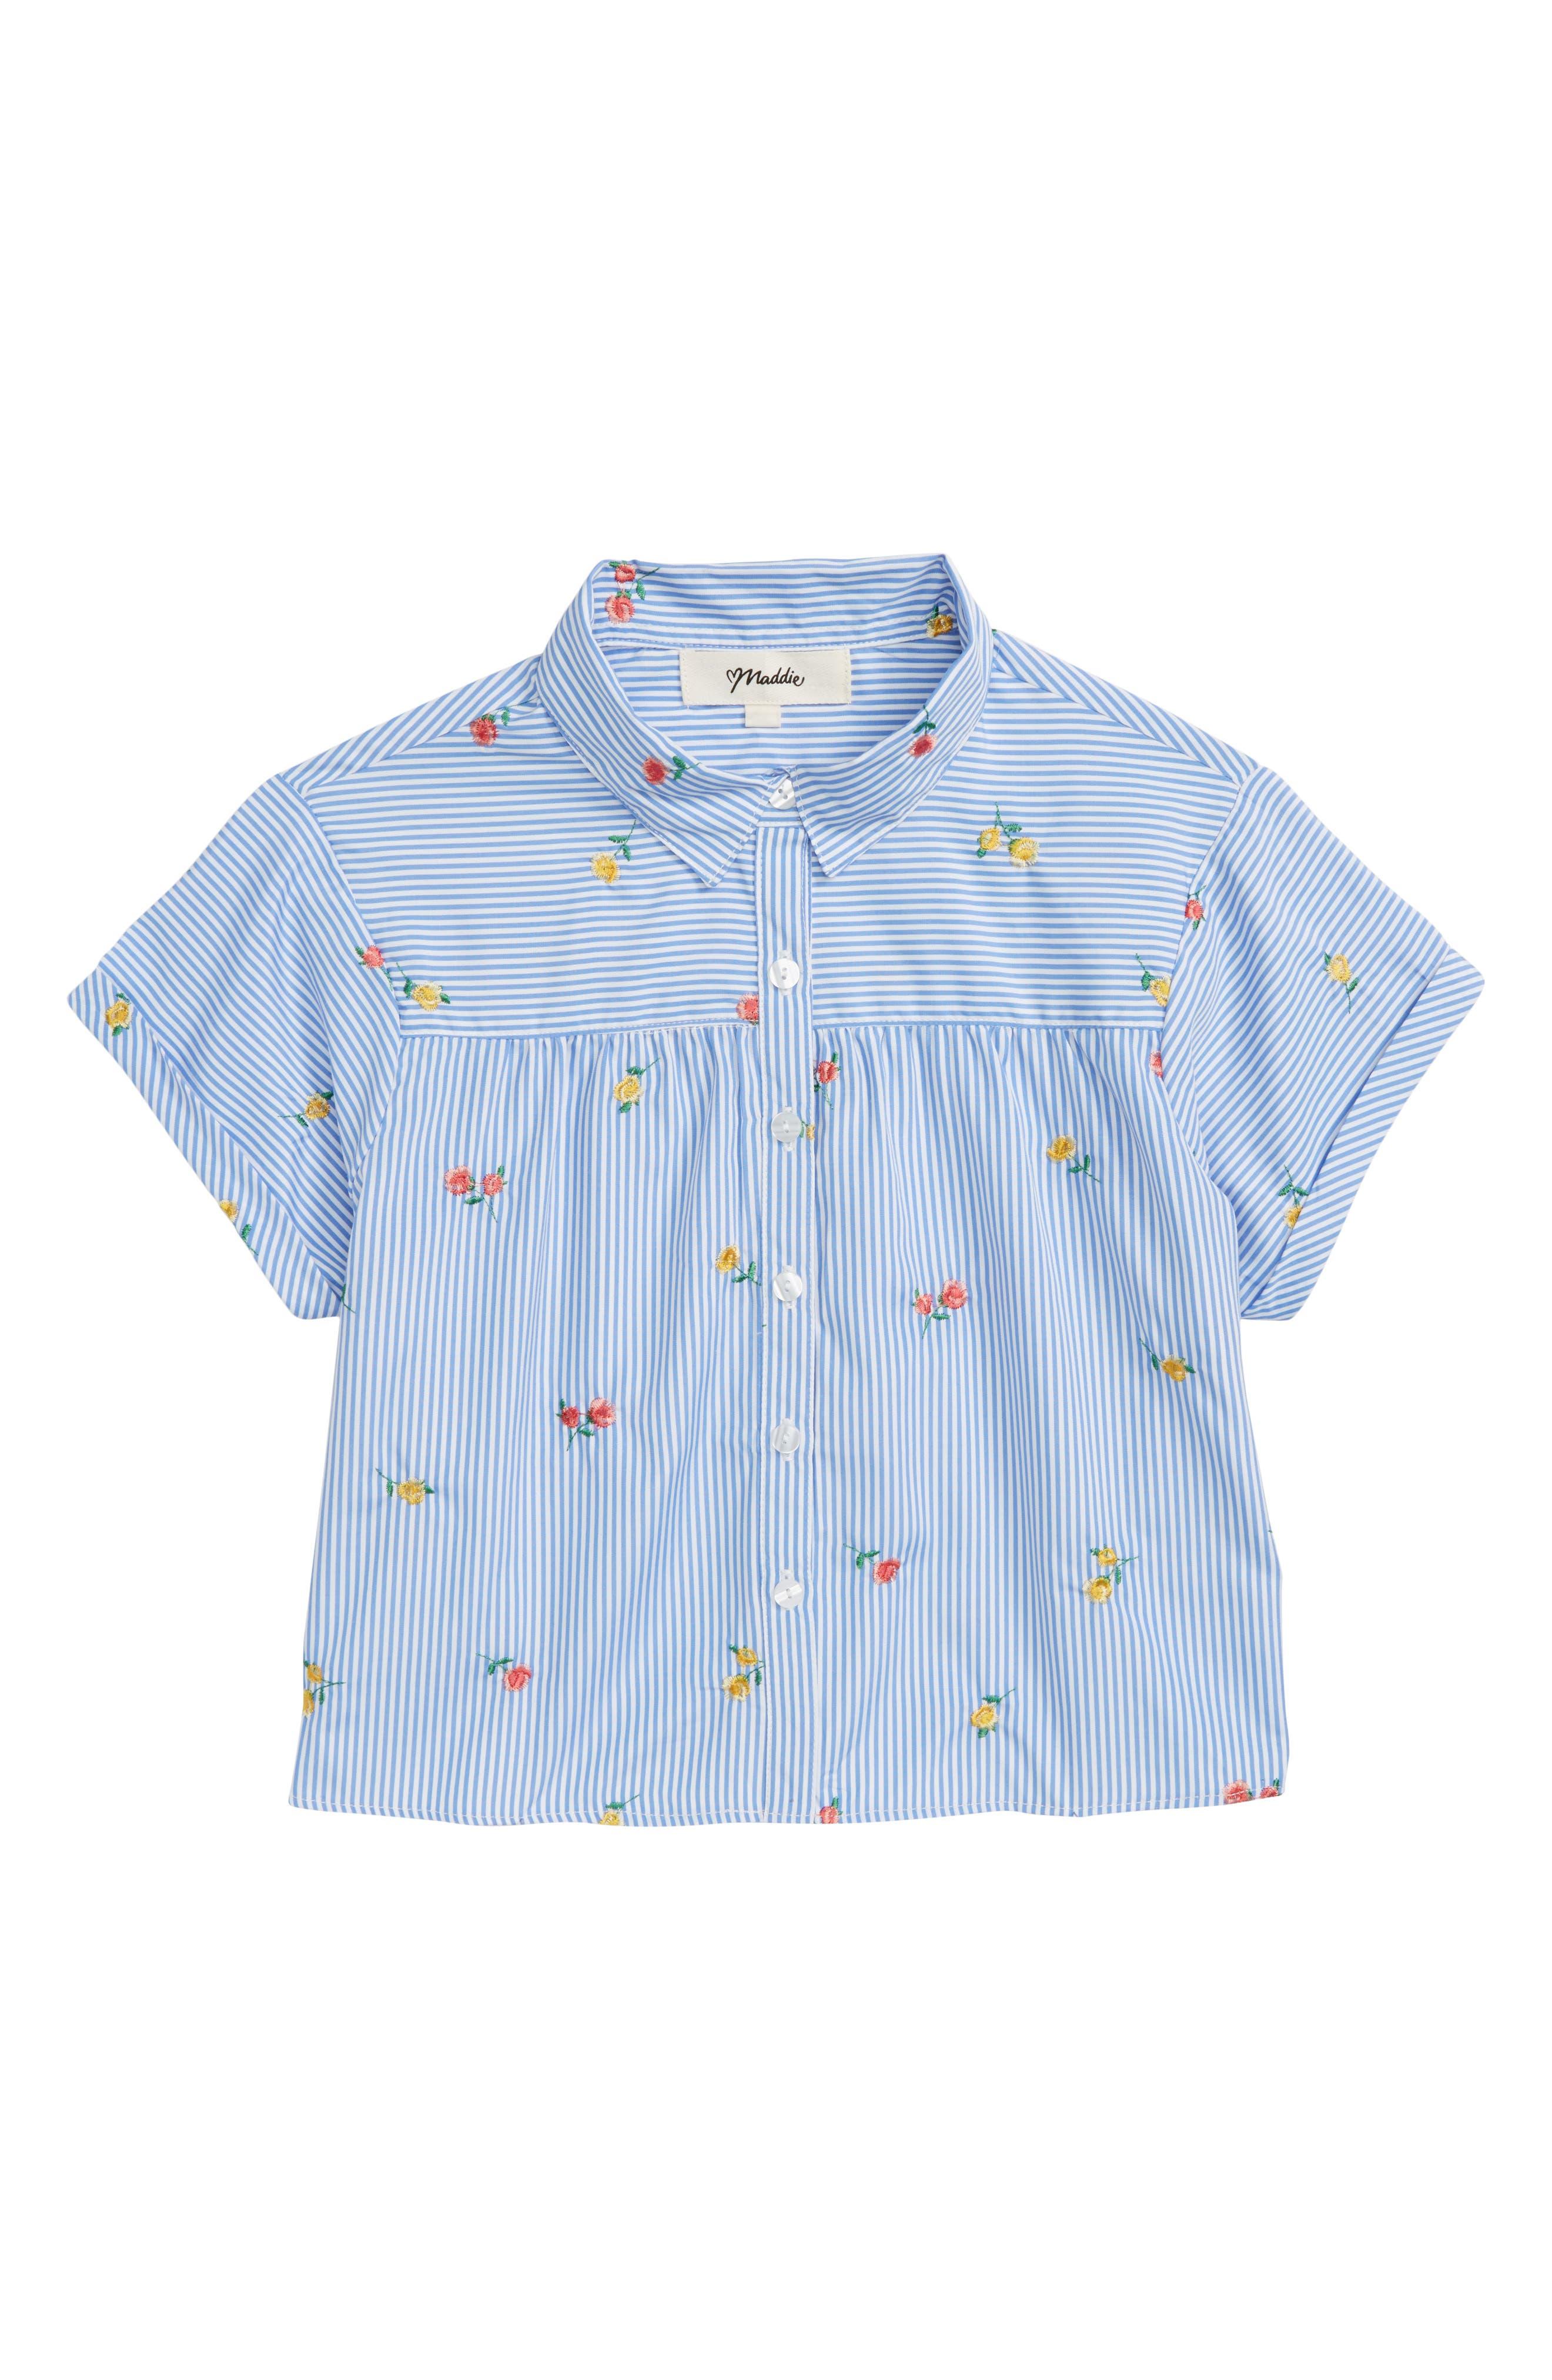 Floral Embroidery Stripe Shirt,                             Main thumbnail 1, color,                             Light Blue/ White